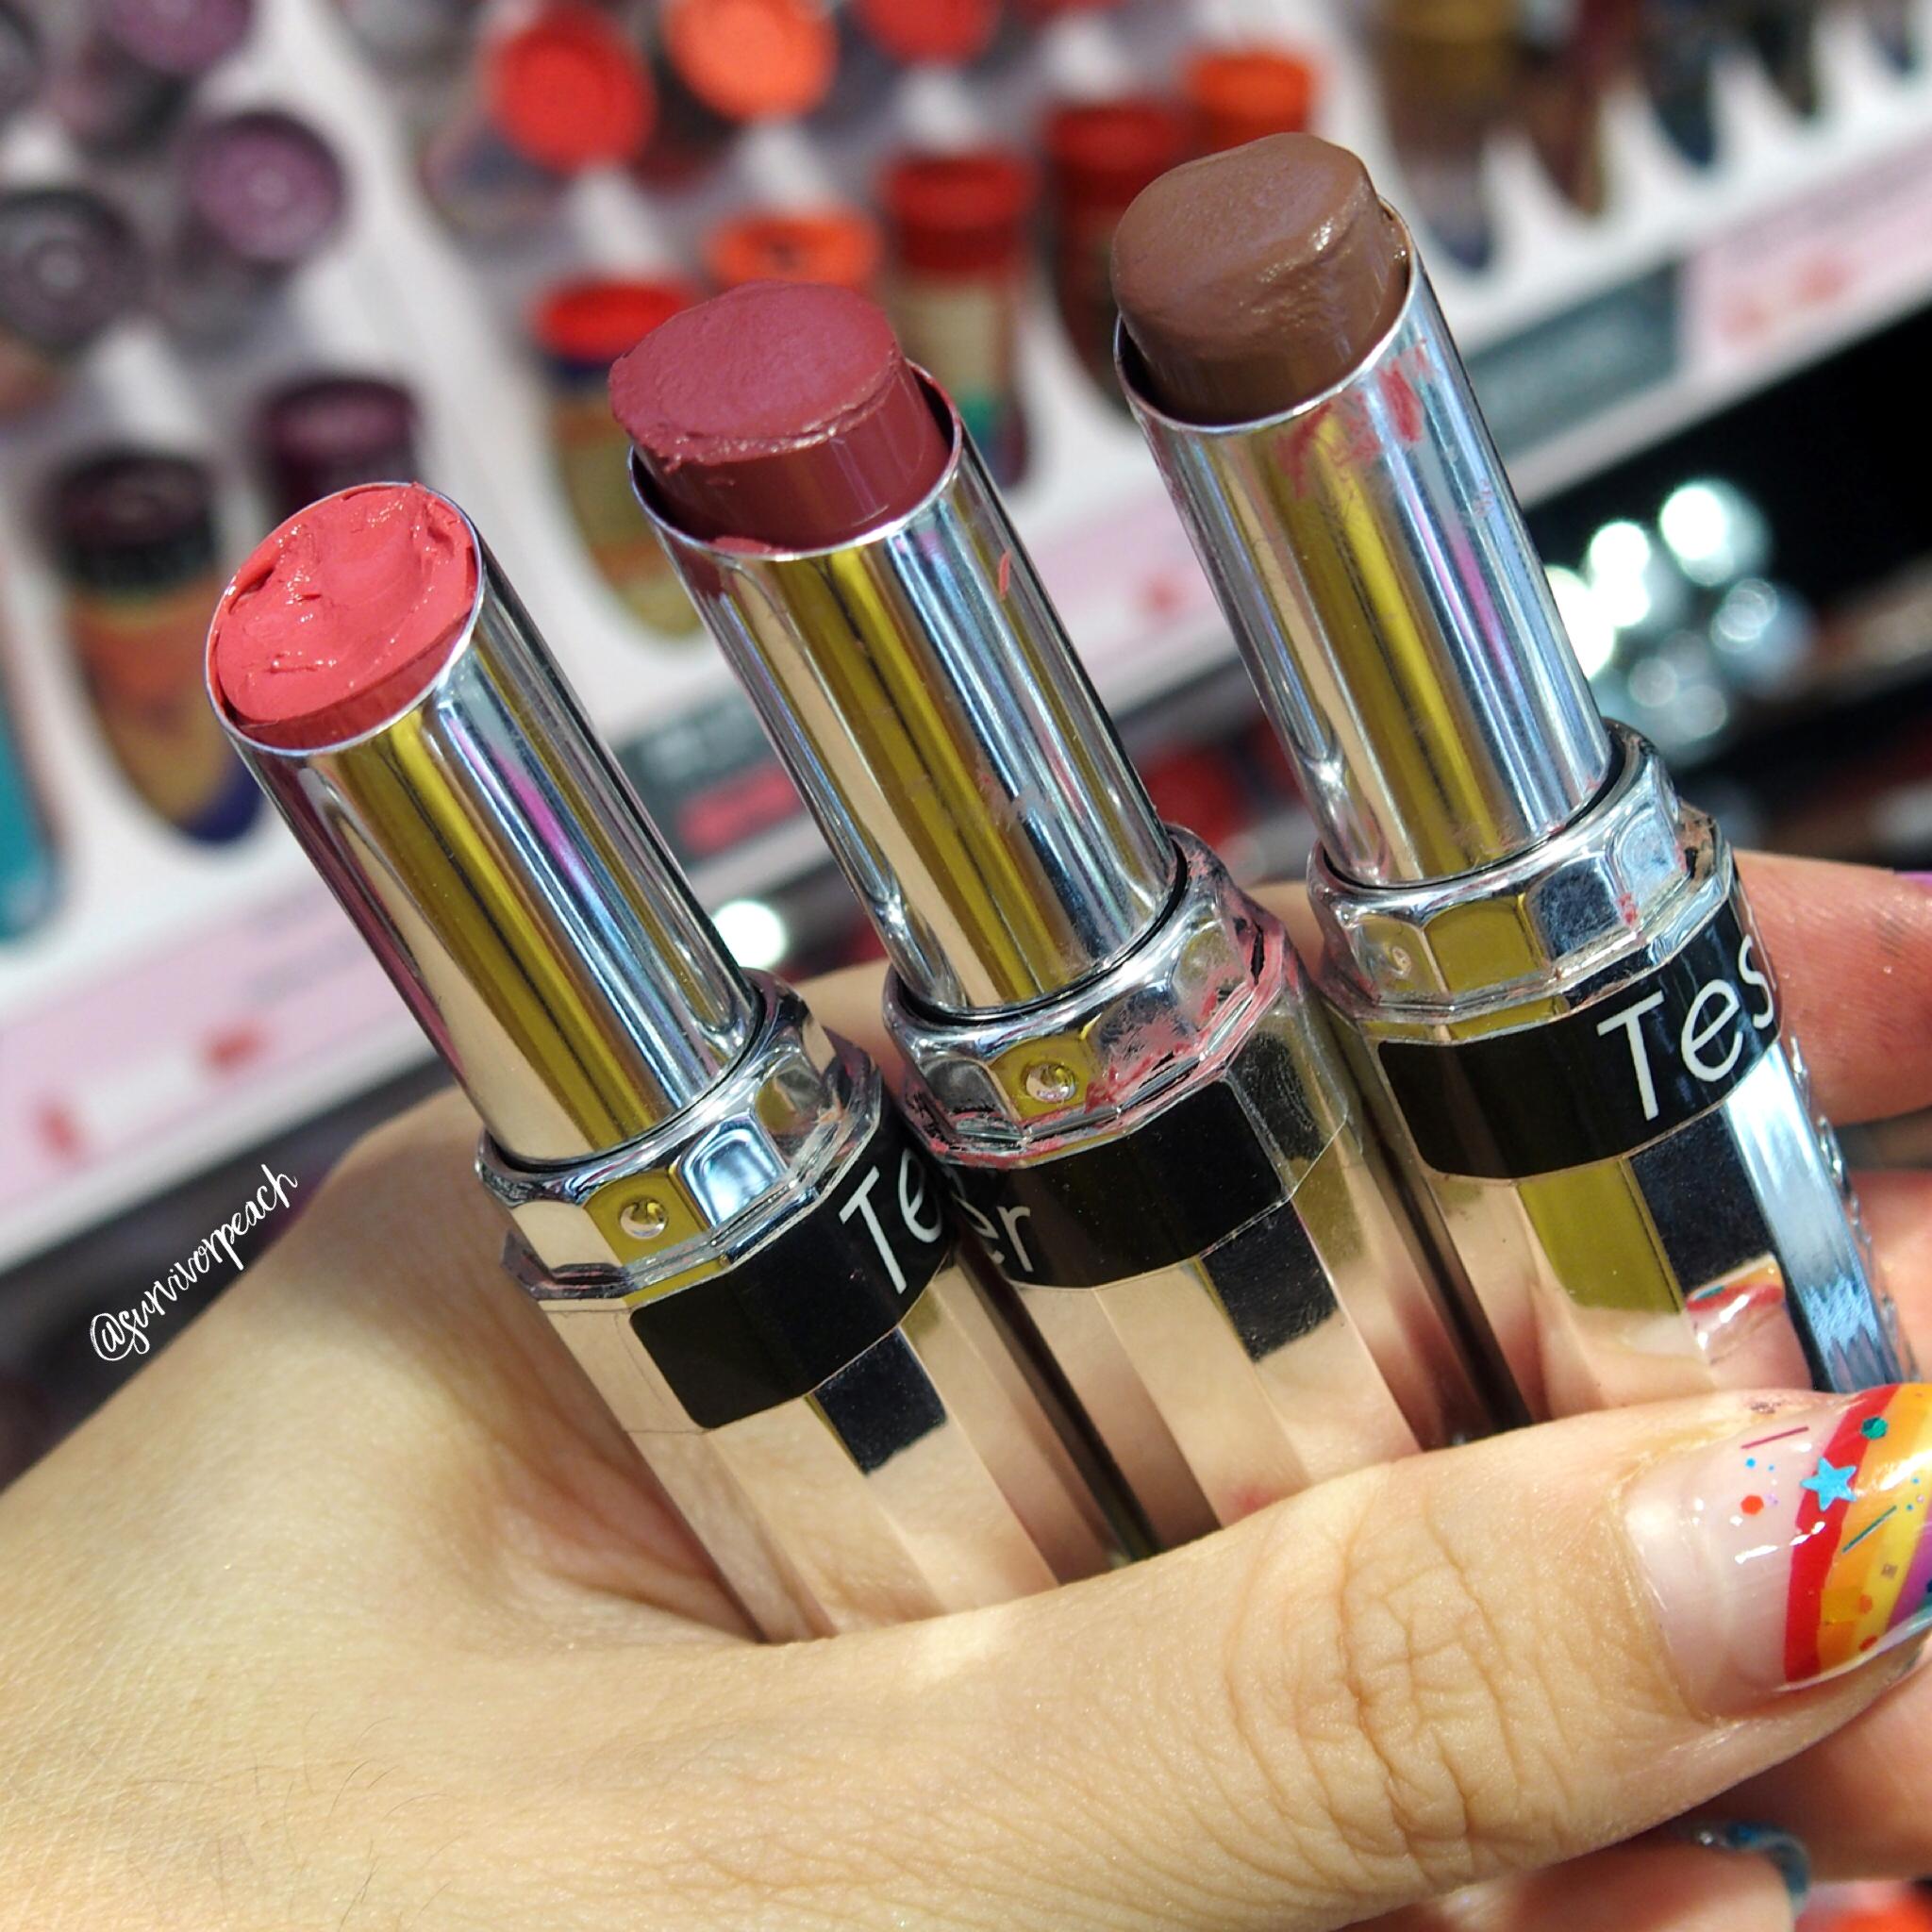 Sephora Collection Lipstick Rouge Lacquer Lipstick - L18 Slay, L19 Stronger, L20 Squad Goals